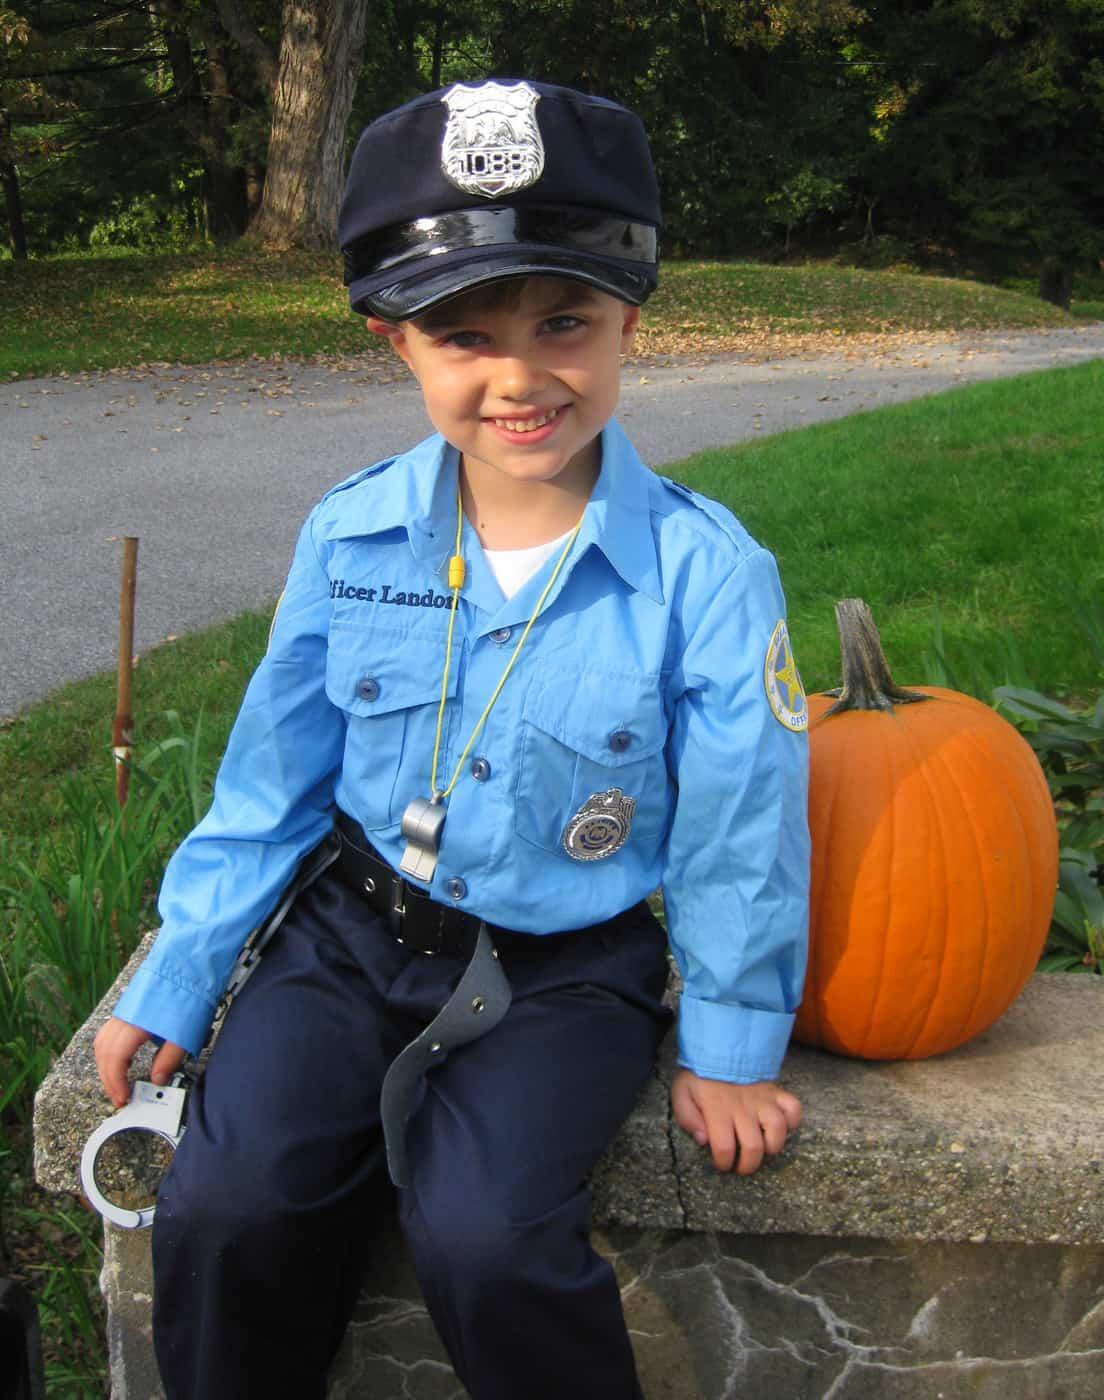 Landon's Halloween Costumes for This Year: Meet Officer Landon